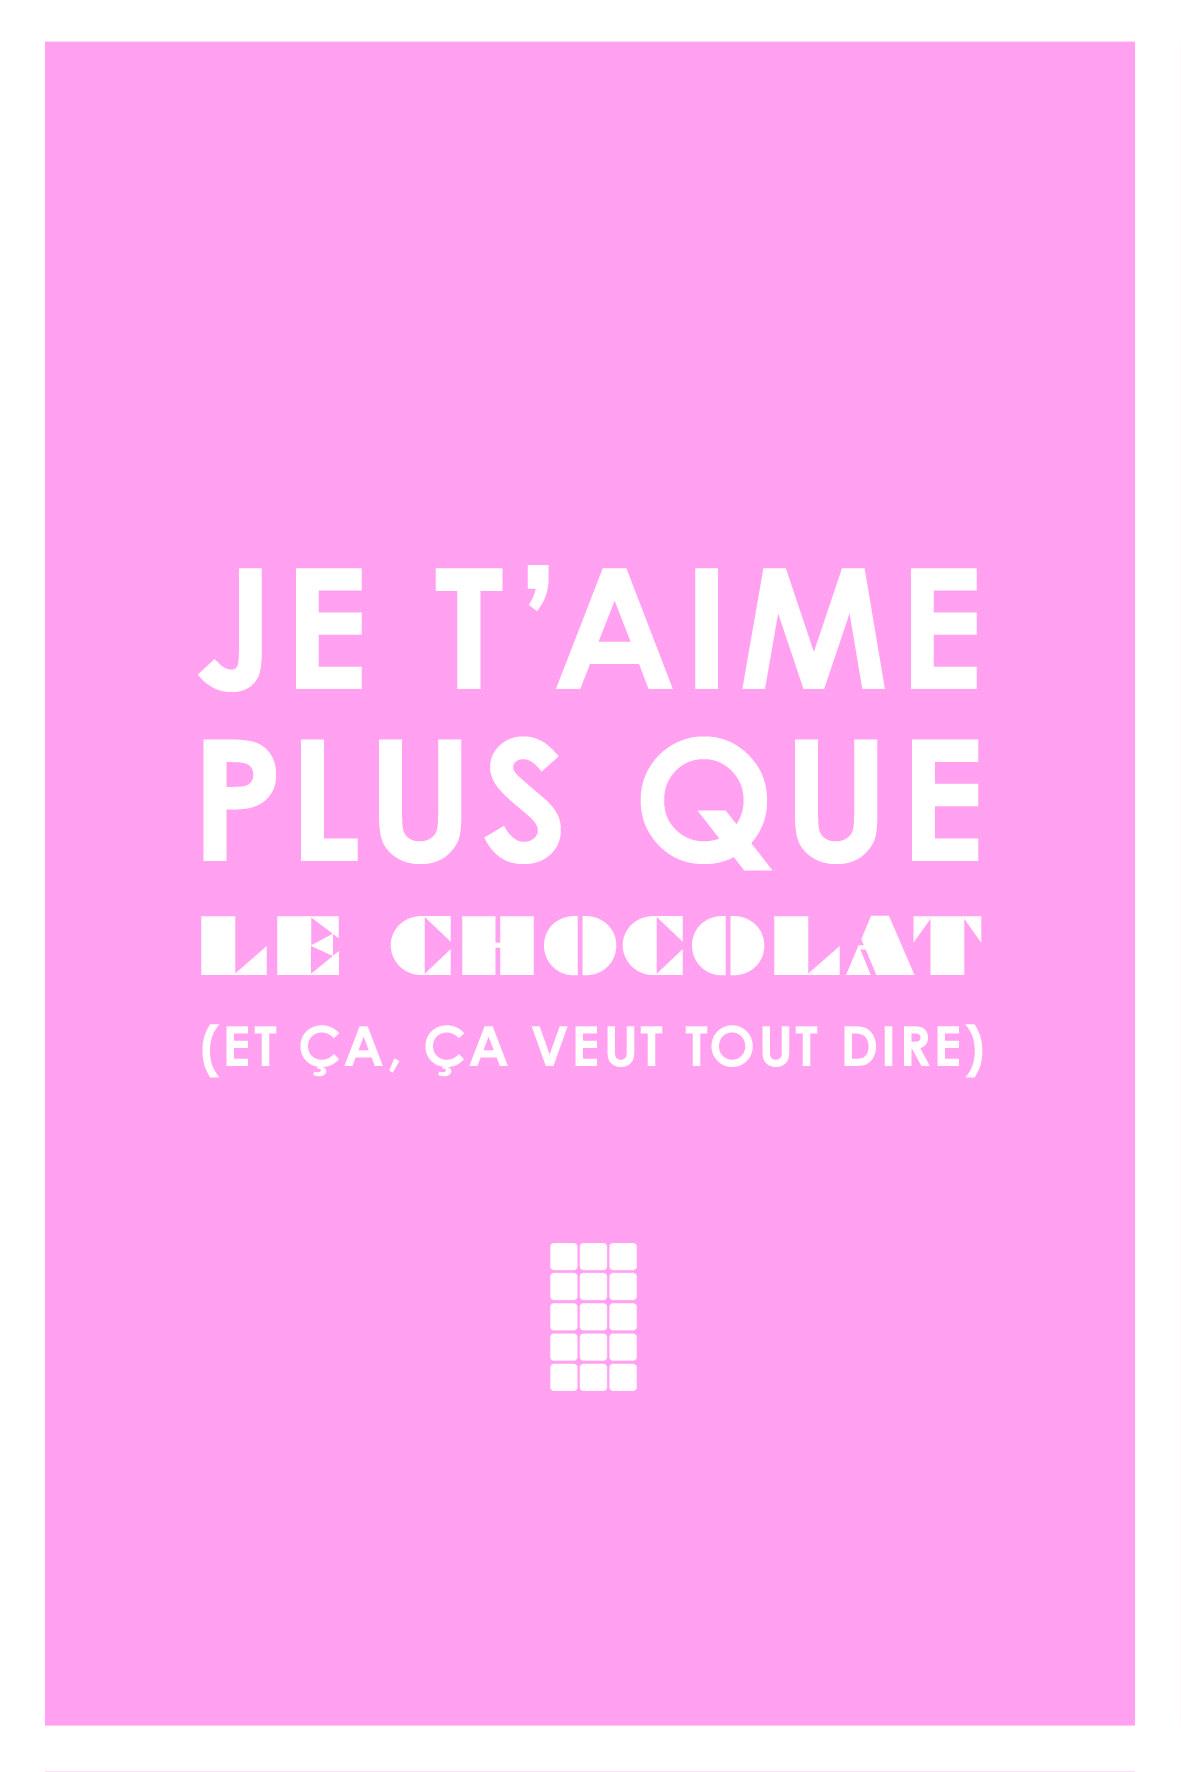 Je Taime Plus Que Le Chocolat Polabox Polaboxinlove